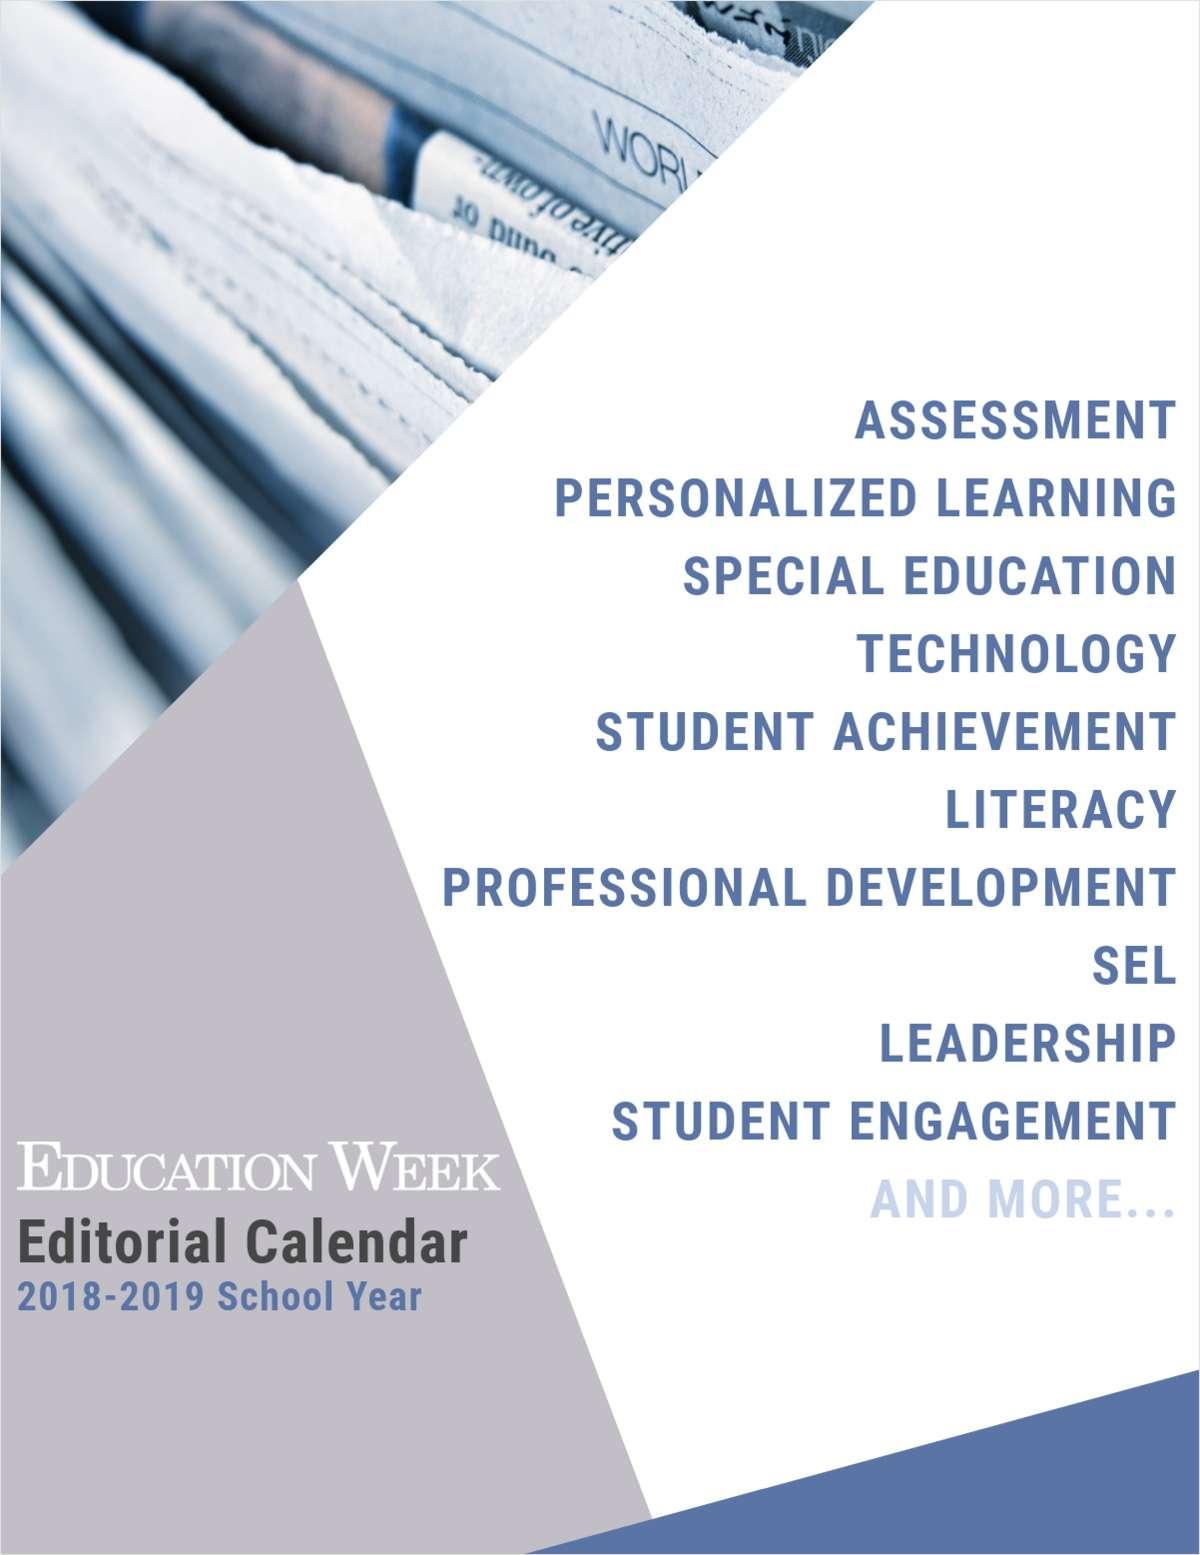 Education Week Editorial Calendar 2018 - 2019